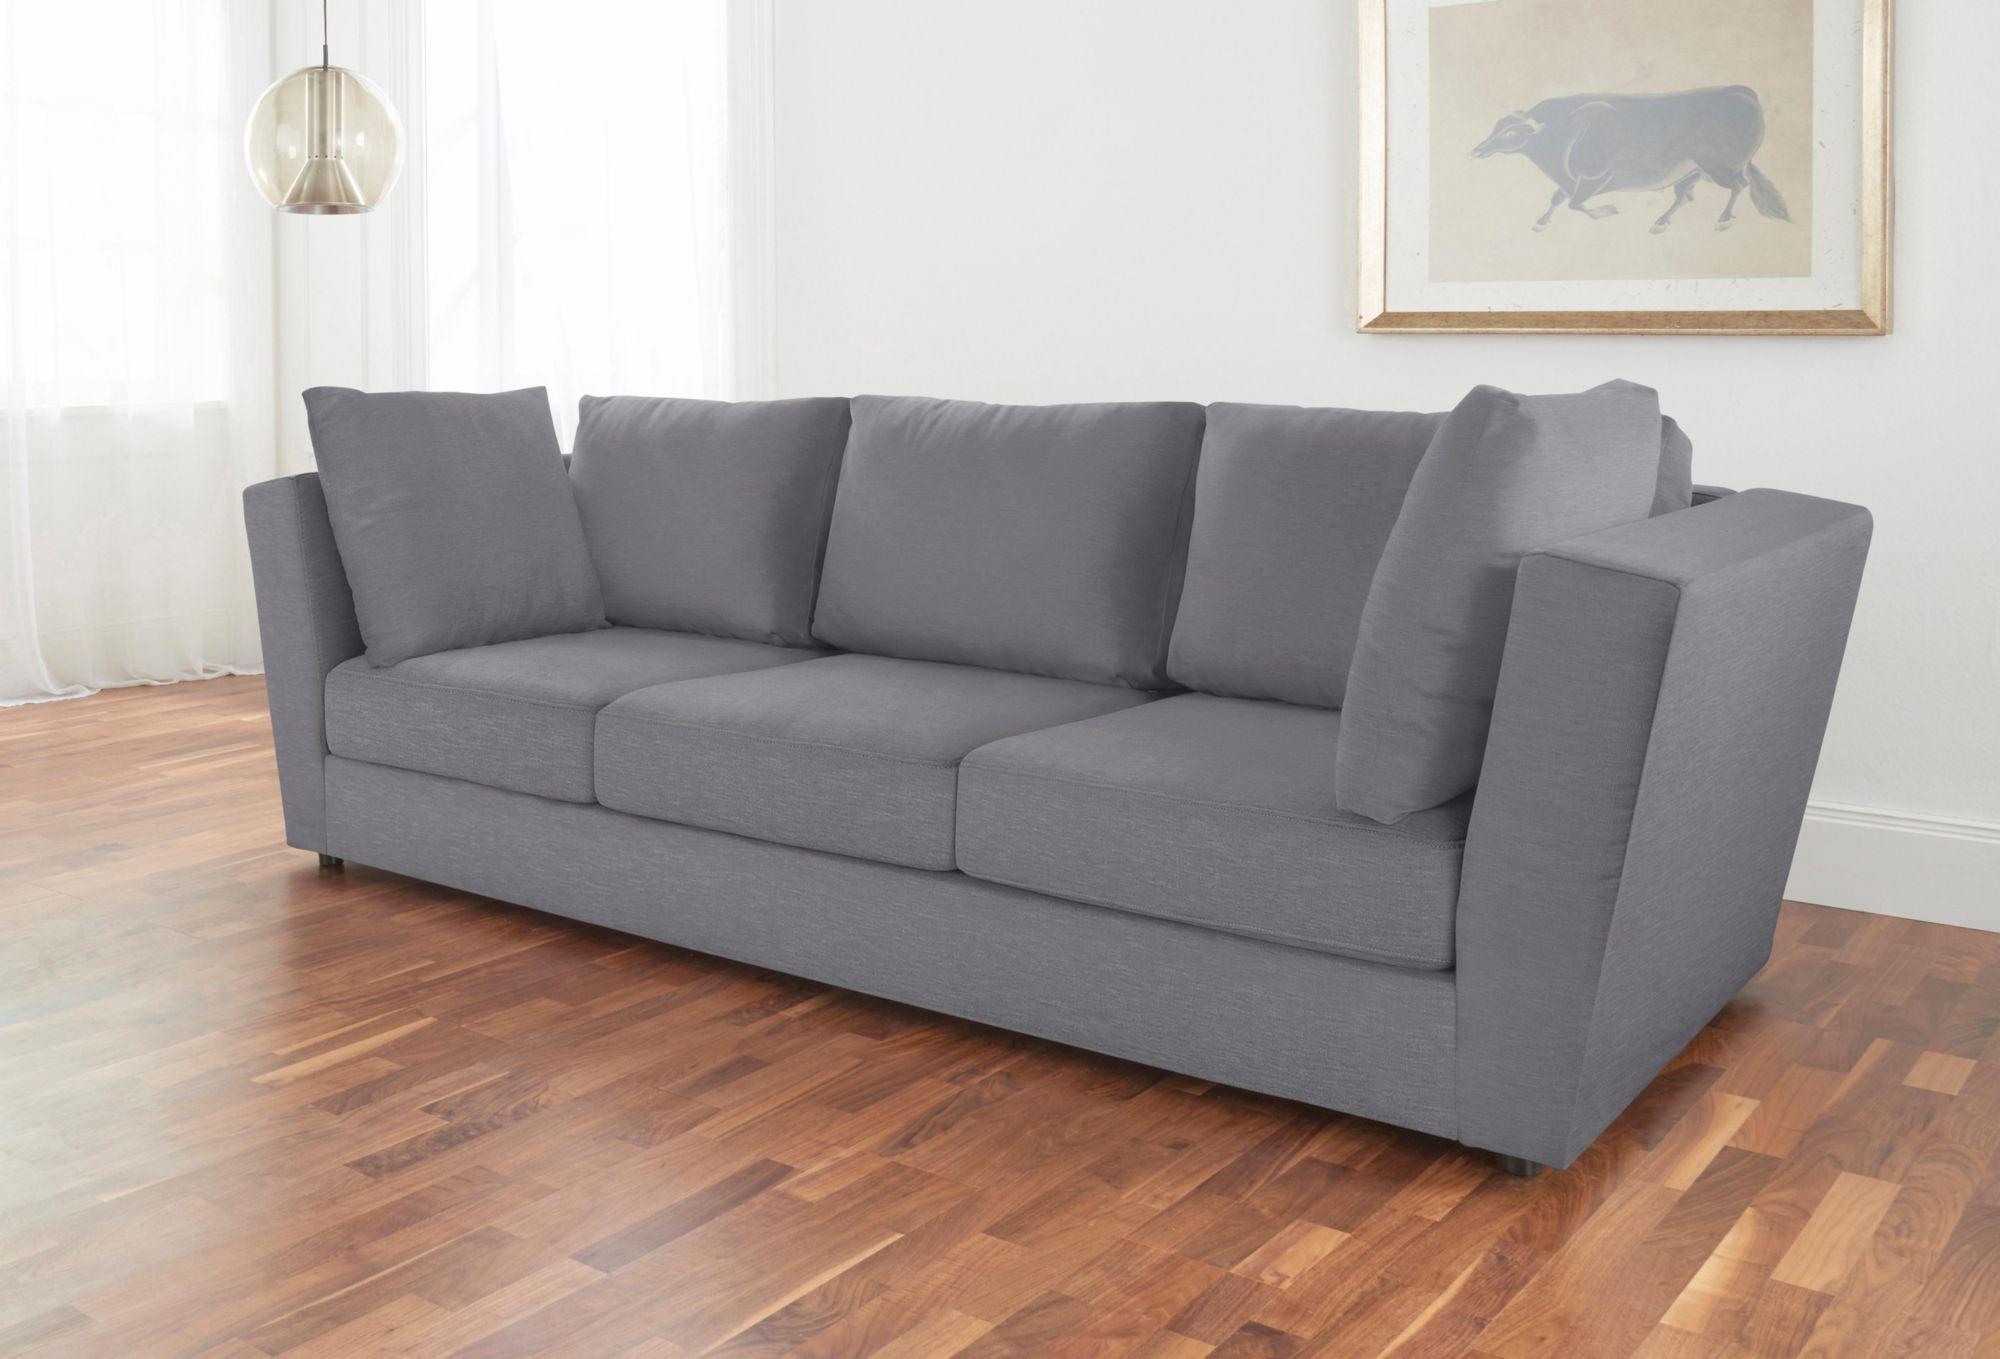 ALTE GERBEREI Alte Gerberei 3-Sitzer Sofa »Pristin« inklusive Armlehnkissen